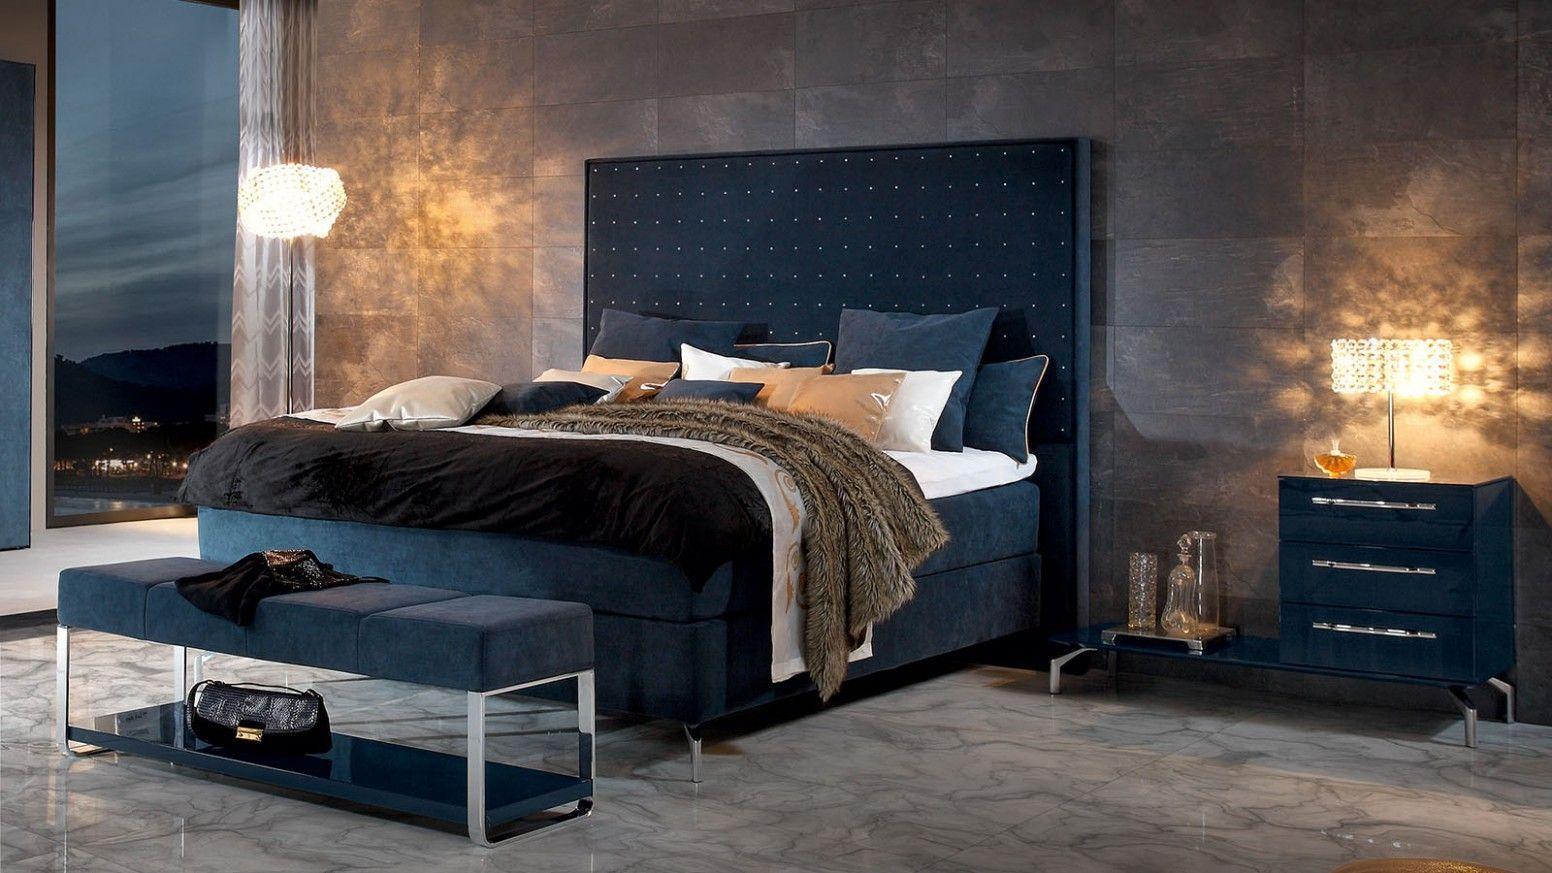 Schlafzimmer Farbe Design Check More At Baladevahome Com